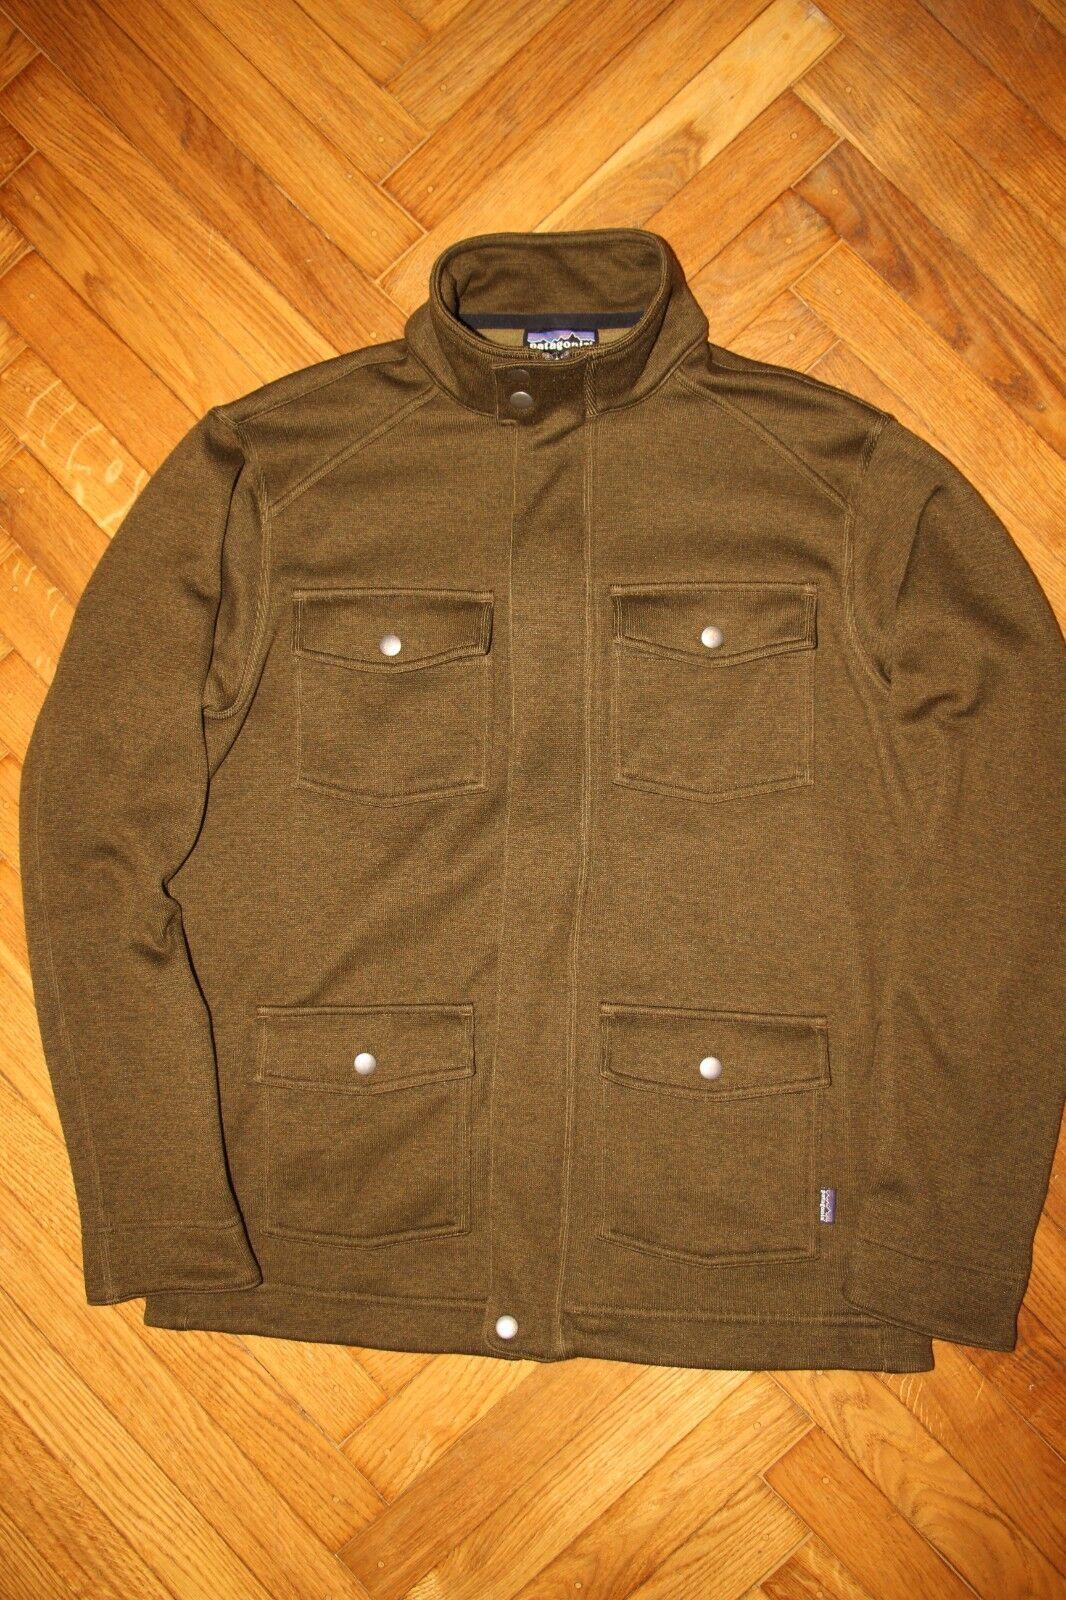 herren Patagonia fleece jacke with pockets Größe M